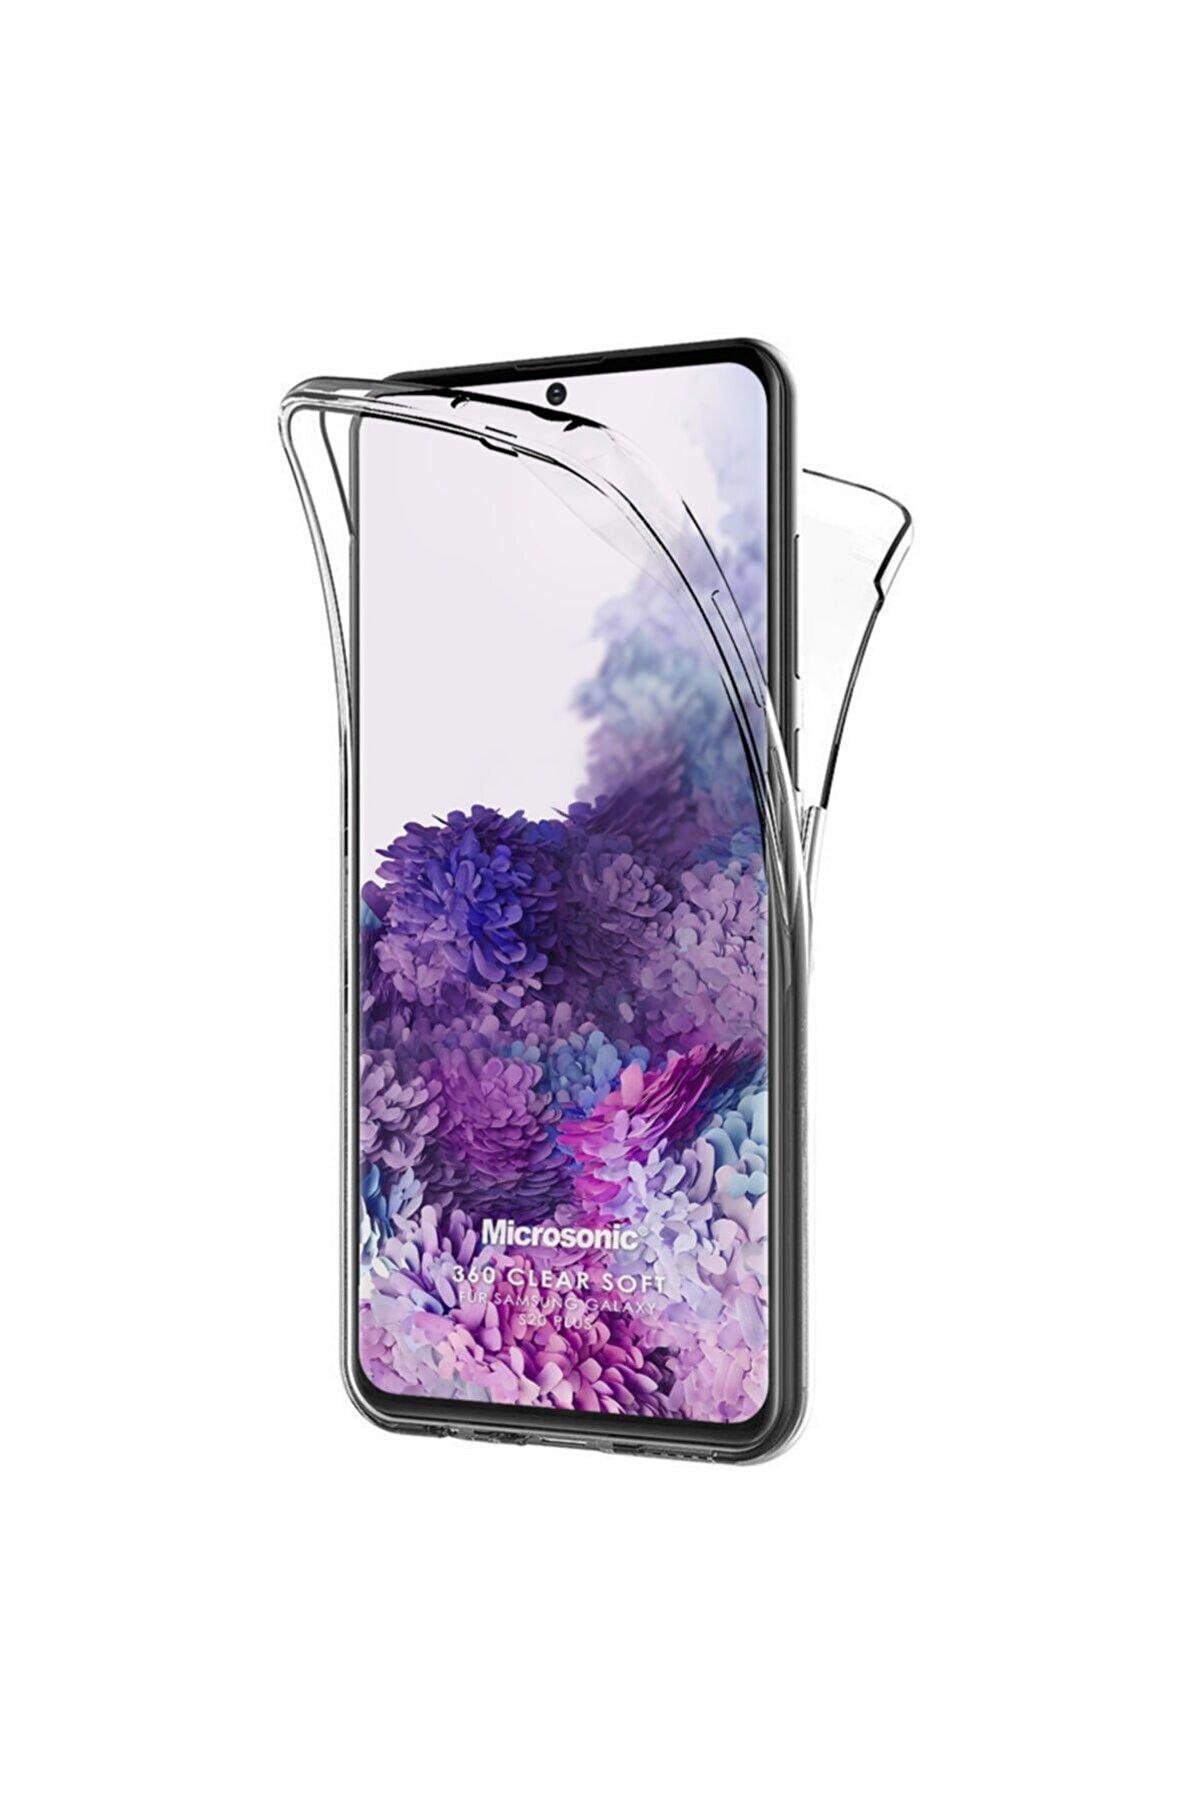 Samsung Microsonic Galaxy S20 Plus Kılıf 6 Tarafı Tam Full Koruma 360 Clear Soft Şeffaf